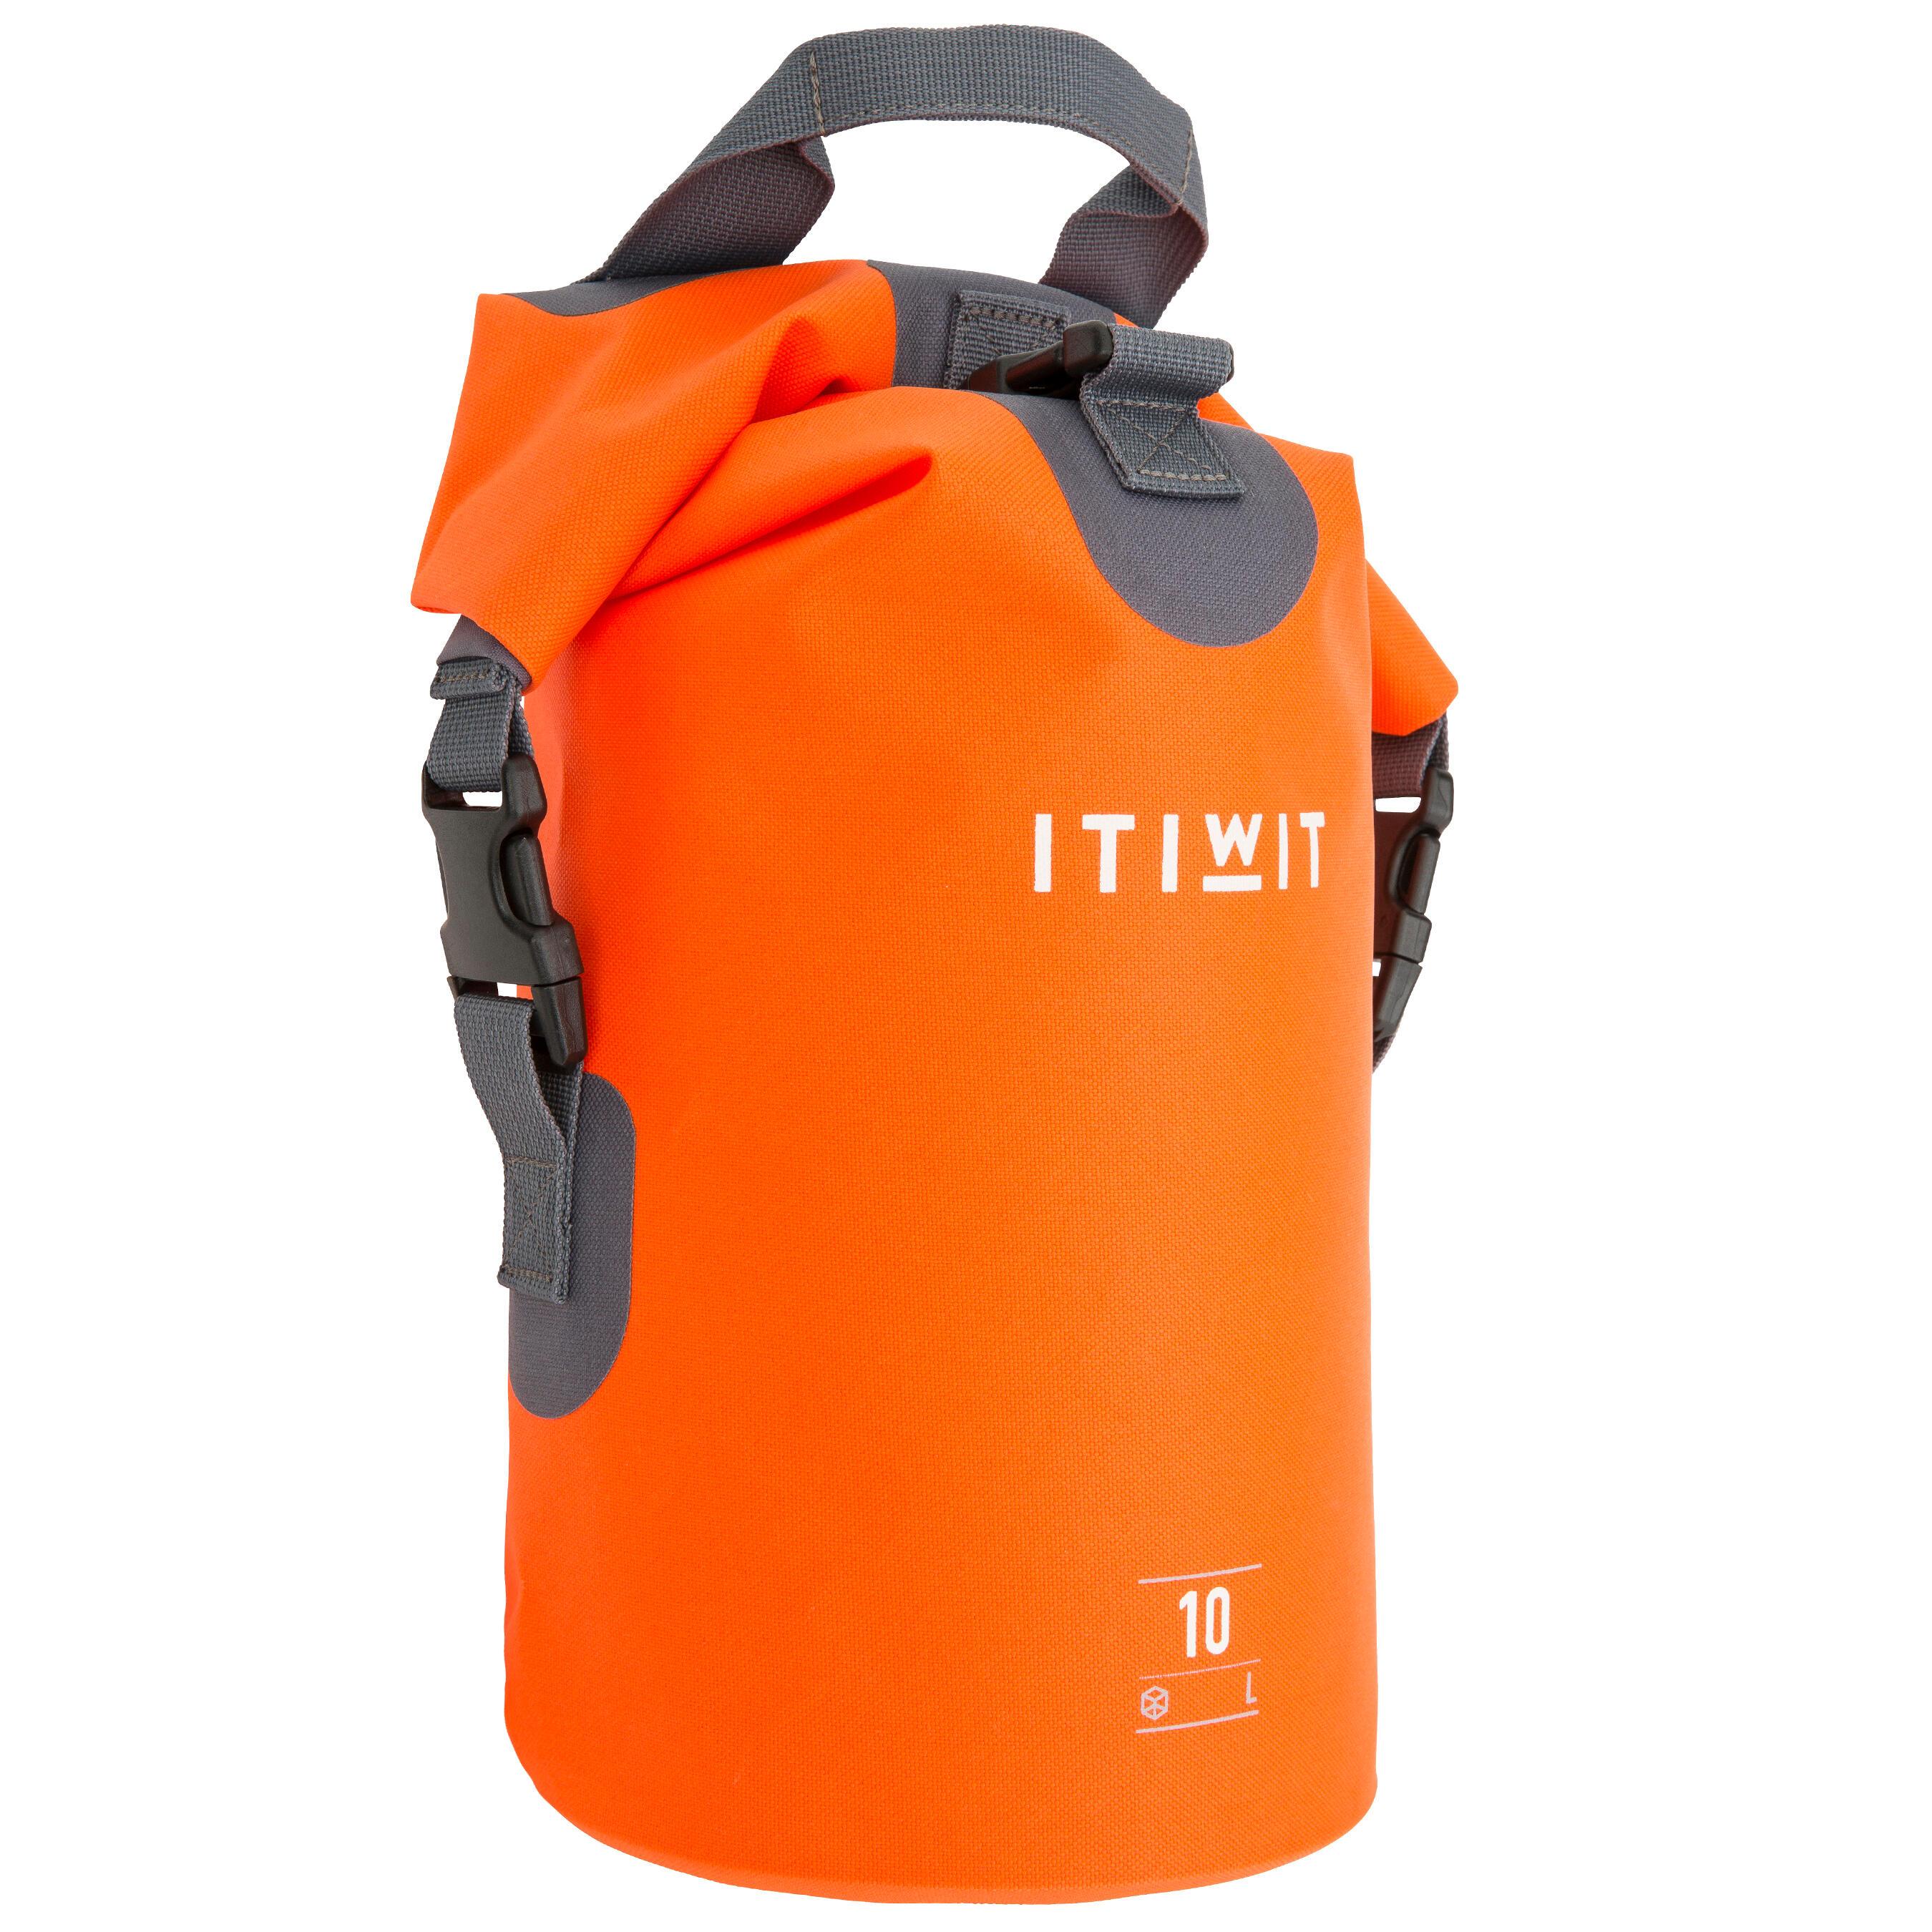 972bcb996ec Itiwit Waterdichte duffel bag 10 l oranje zonder schouderriem | Decathlon.nl